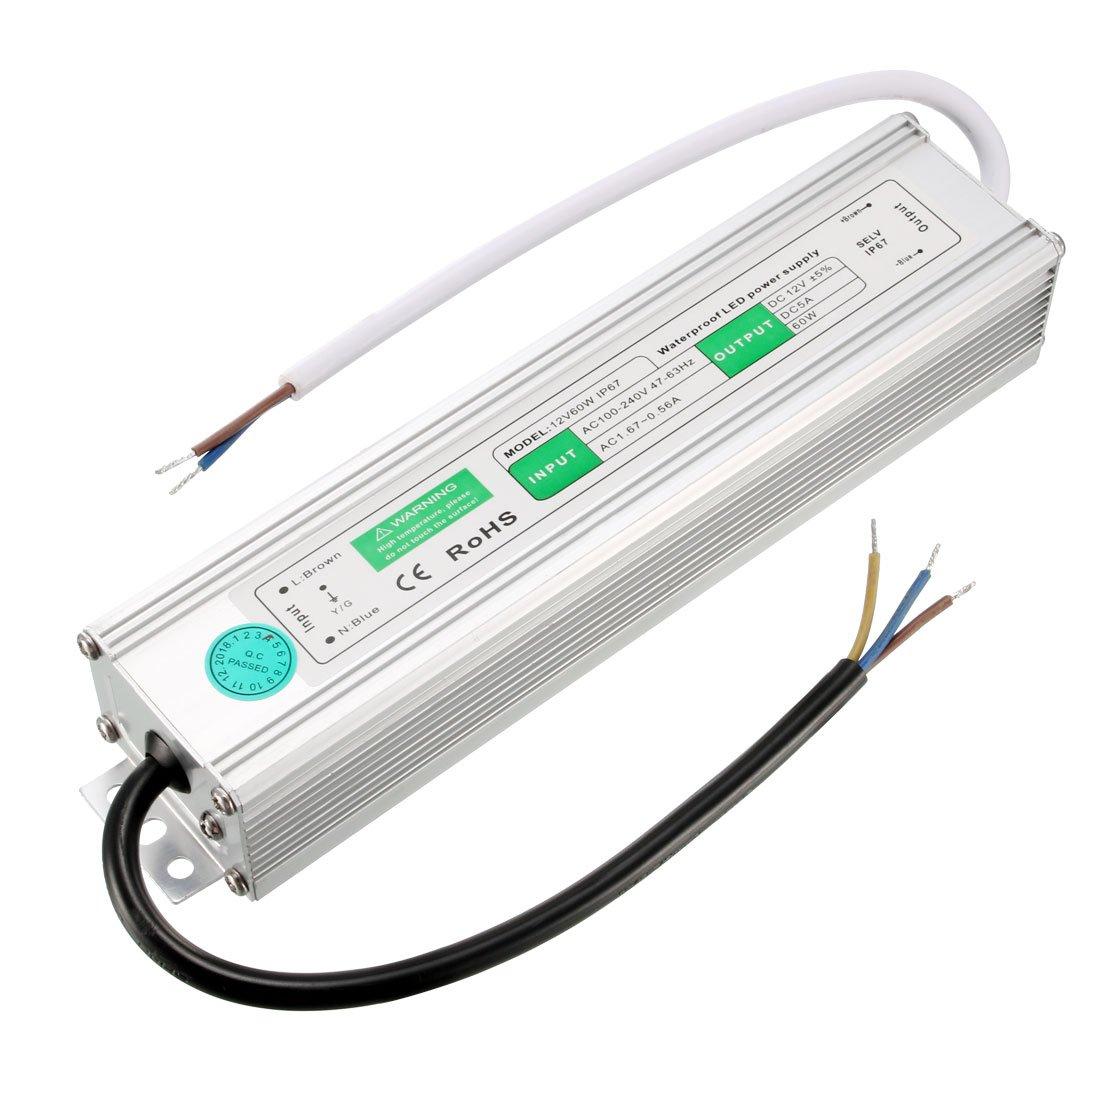 uxcell LED Driver Power Supply IP67 Waterproof,AC110~260V to DC12V 100 Watt Transformer